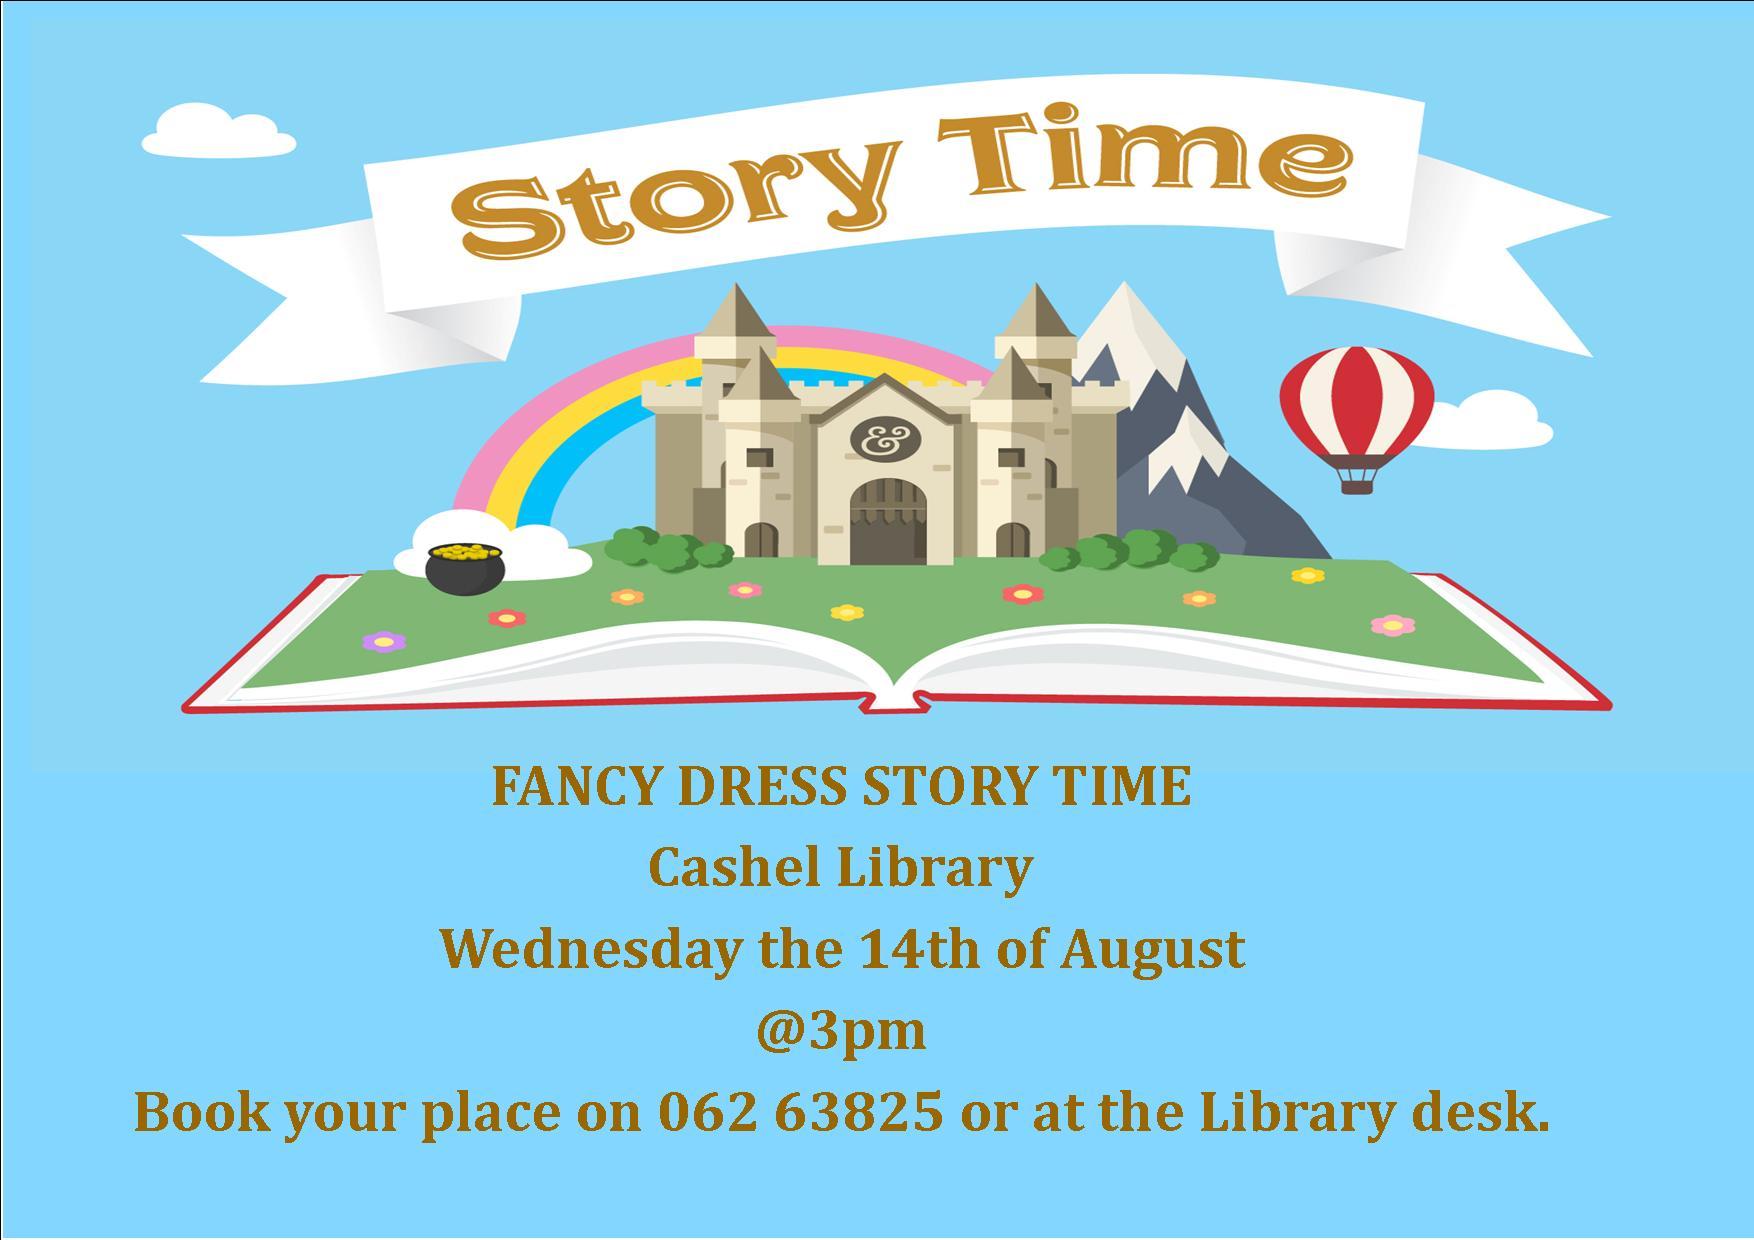 Fancy Dress Storytime in Cashel Library